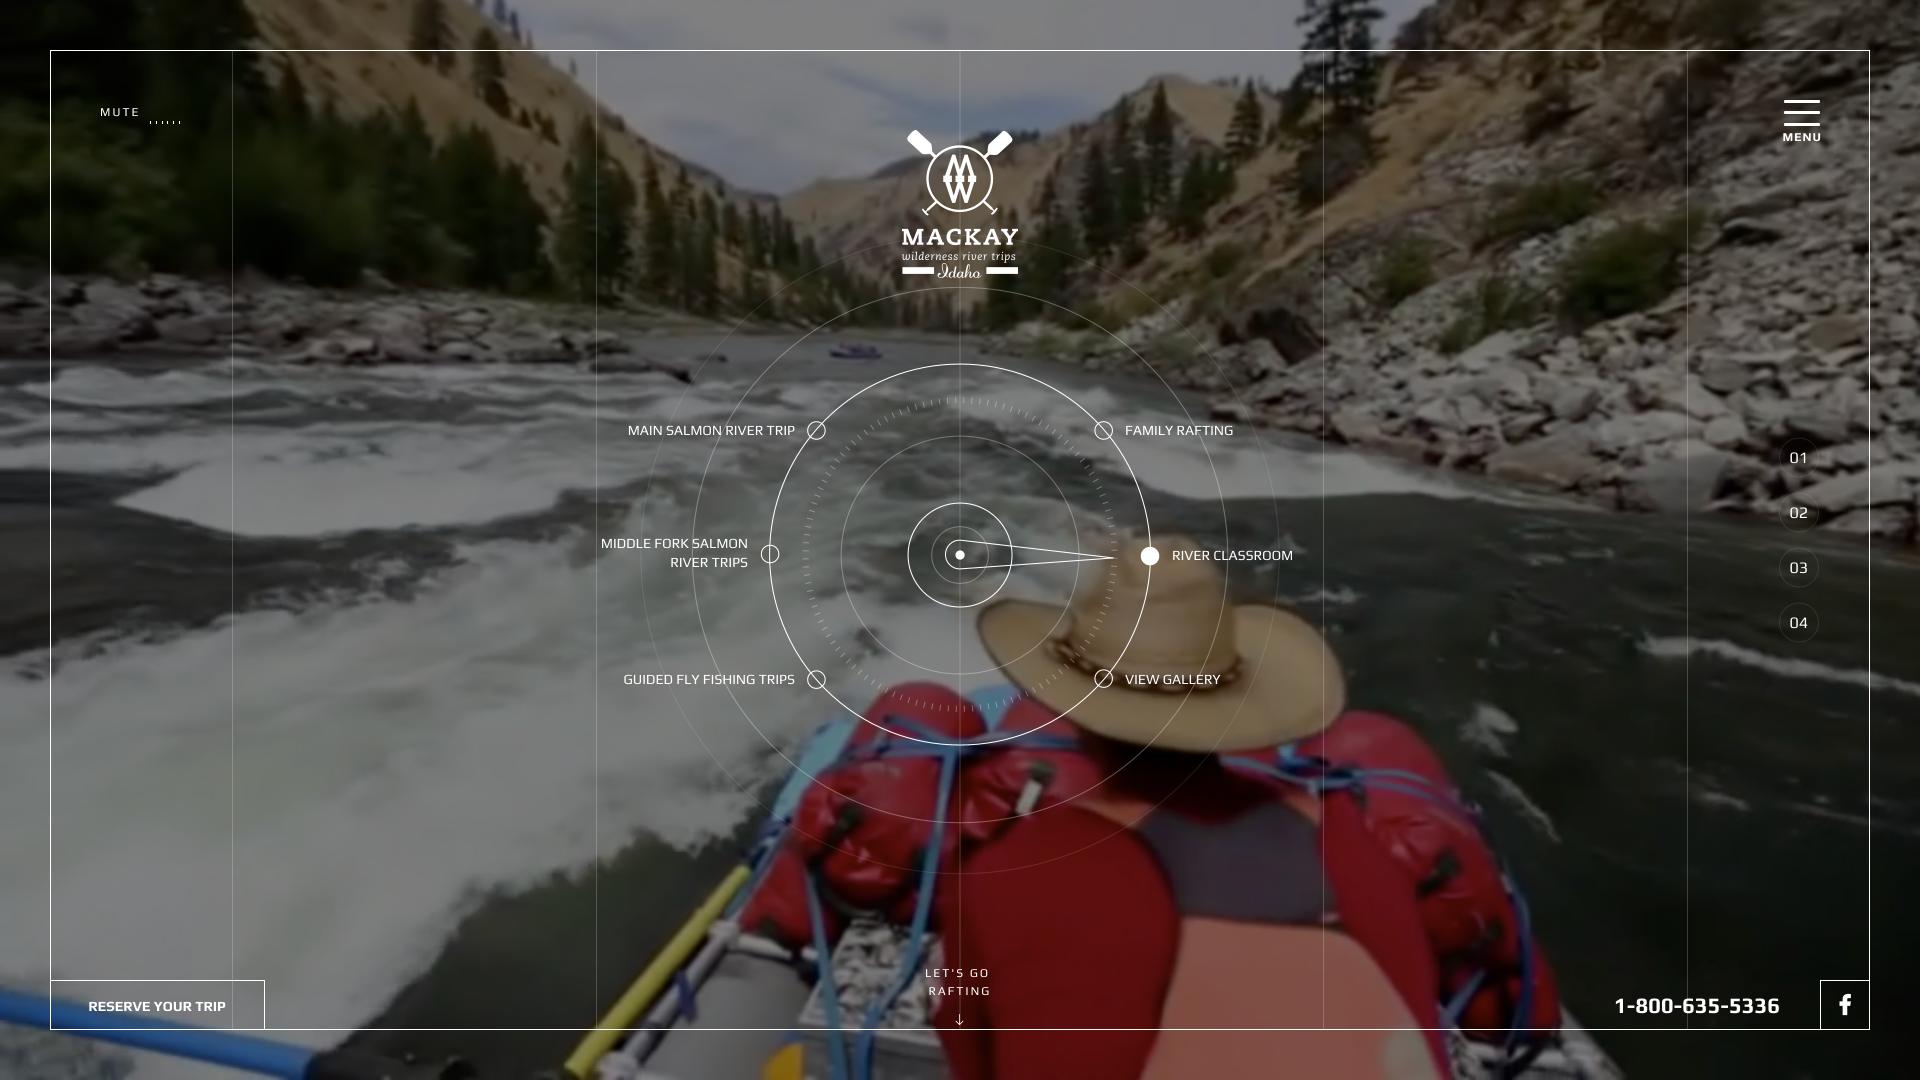 Mackay River Website Design Preview